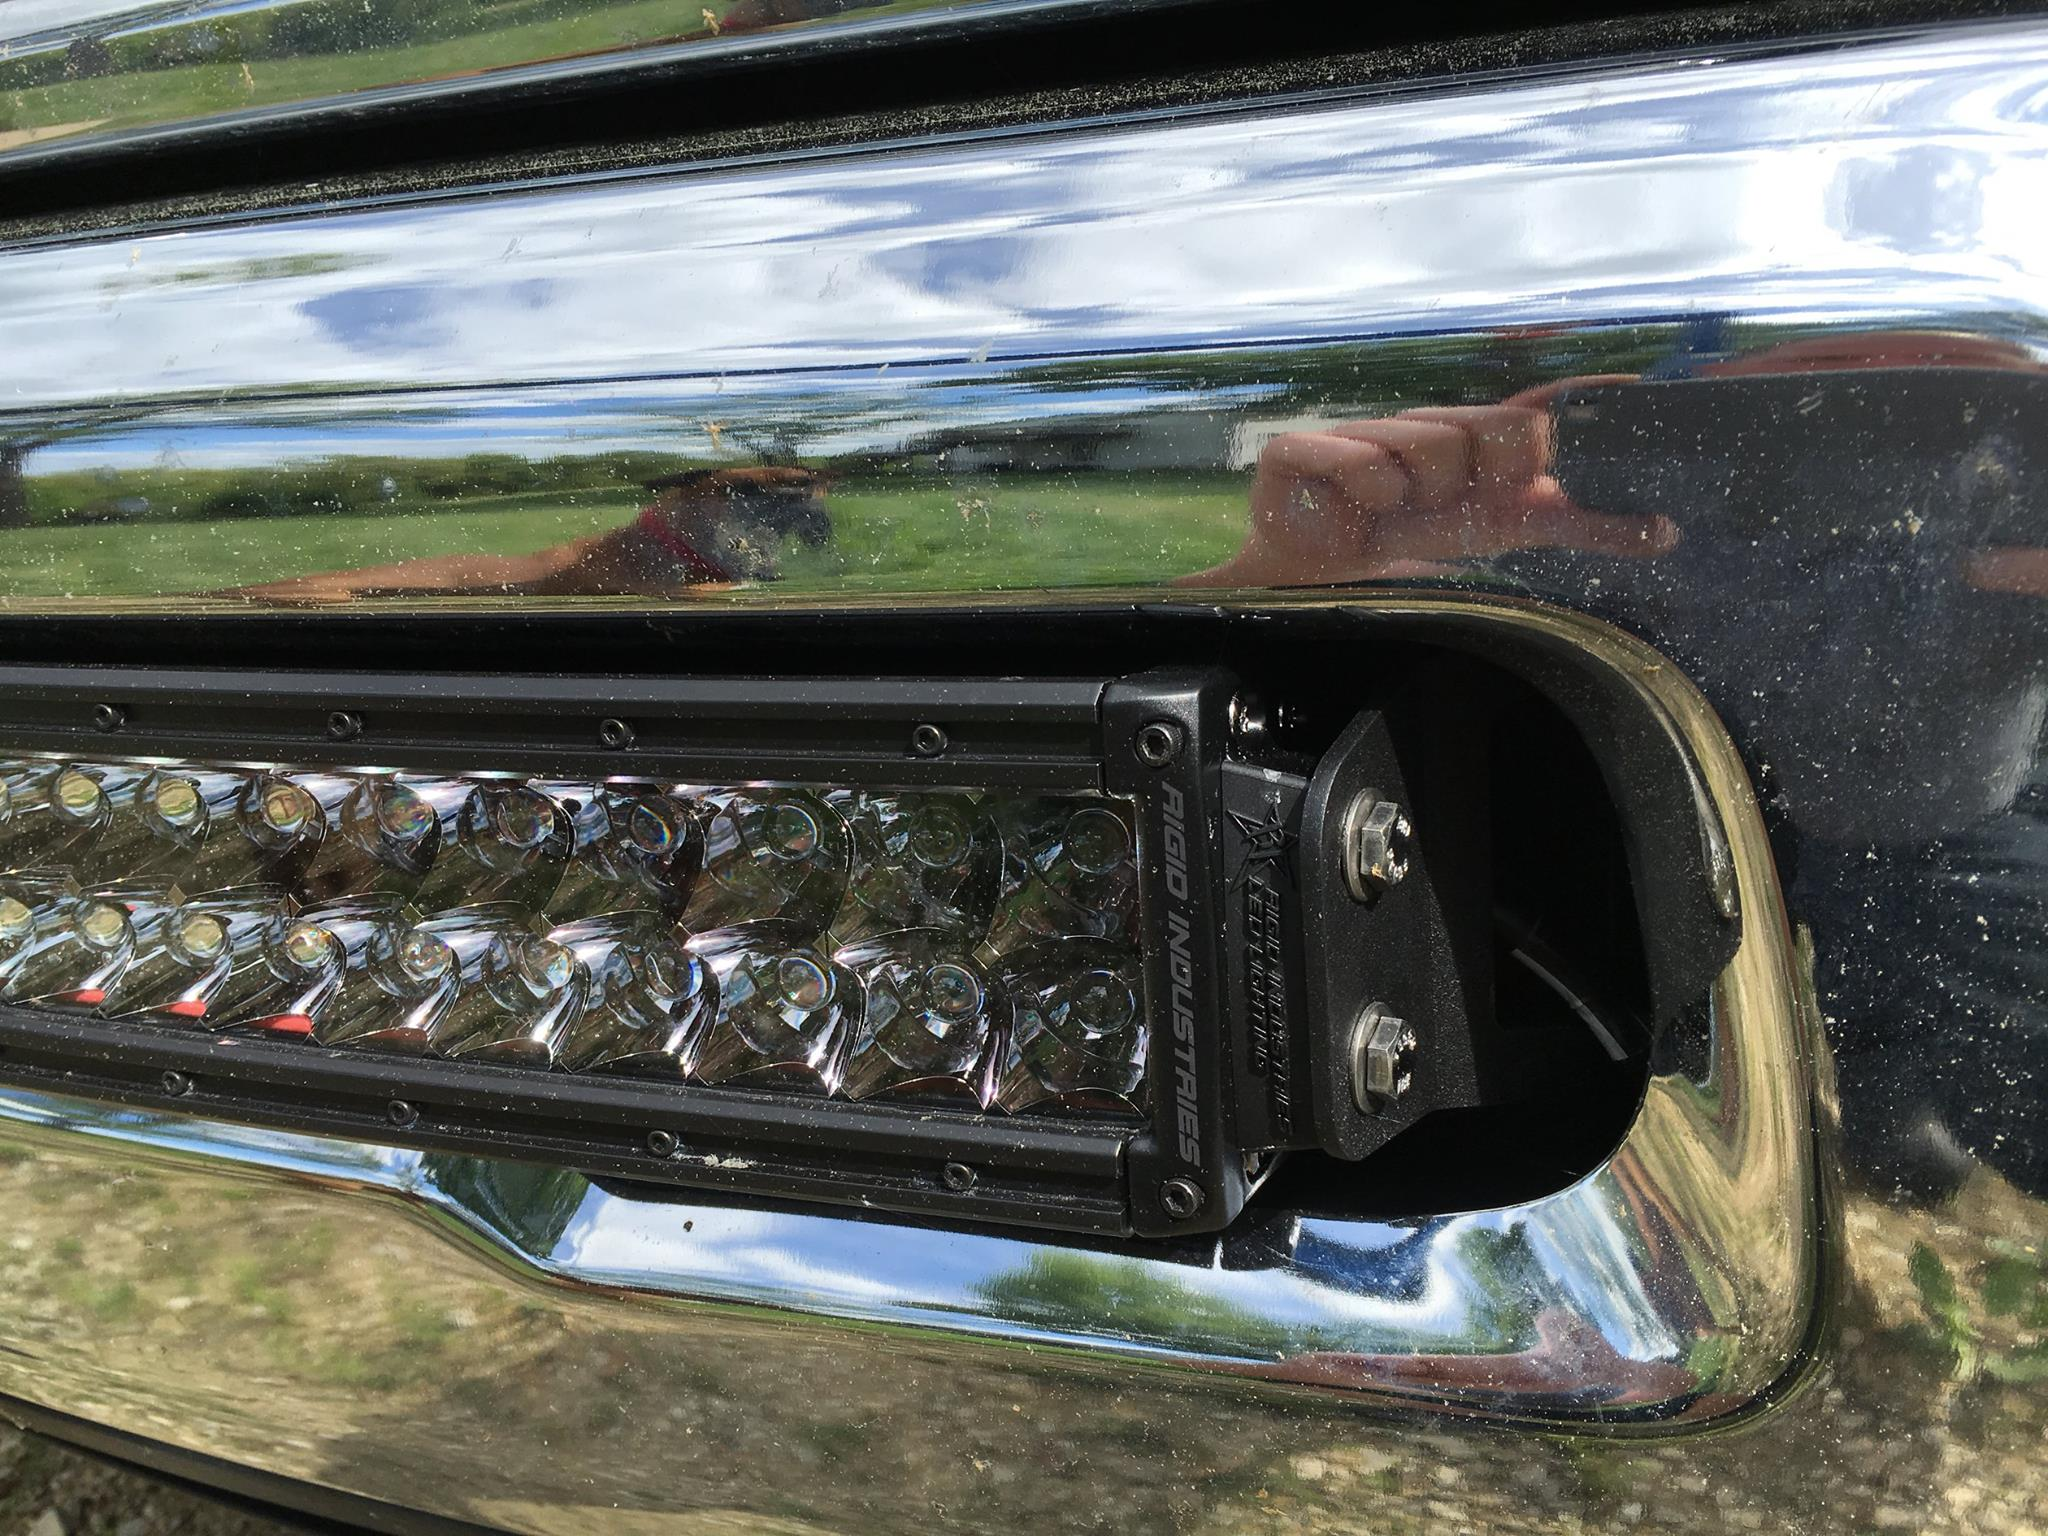 10 16 25003500 40 rigid rds light bar bumper brackets quick view aloadofball Choice Image